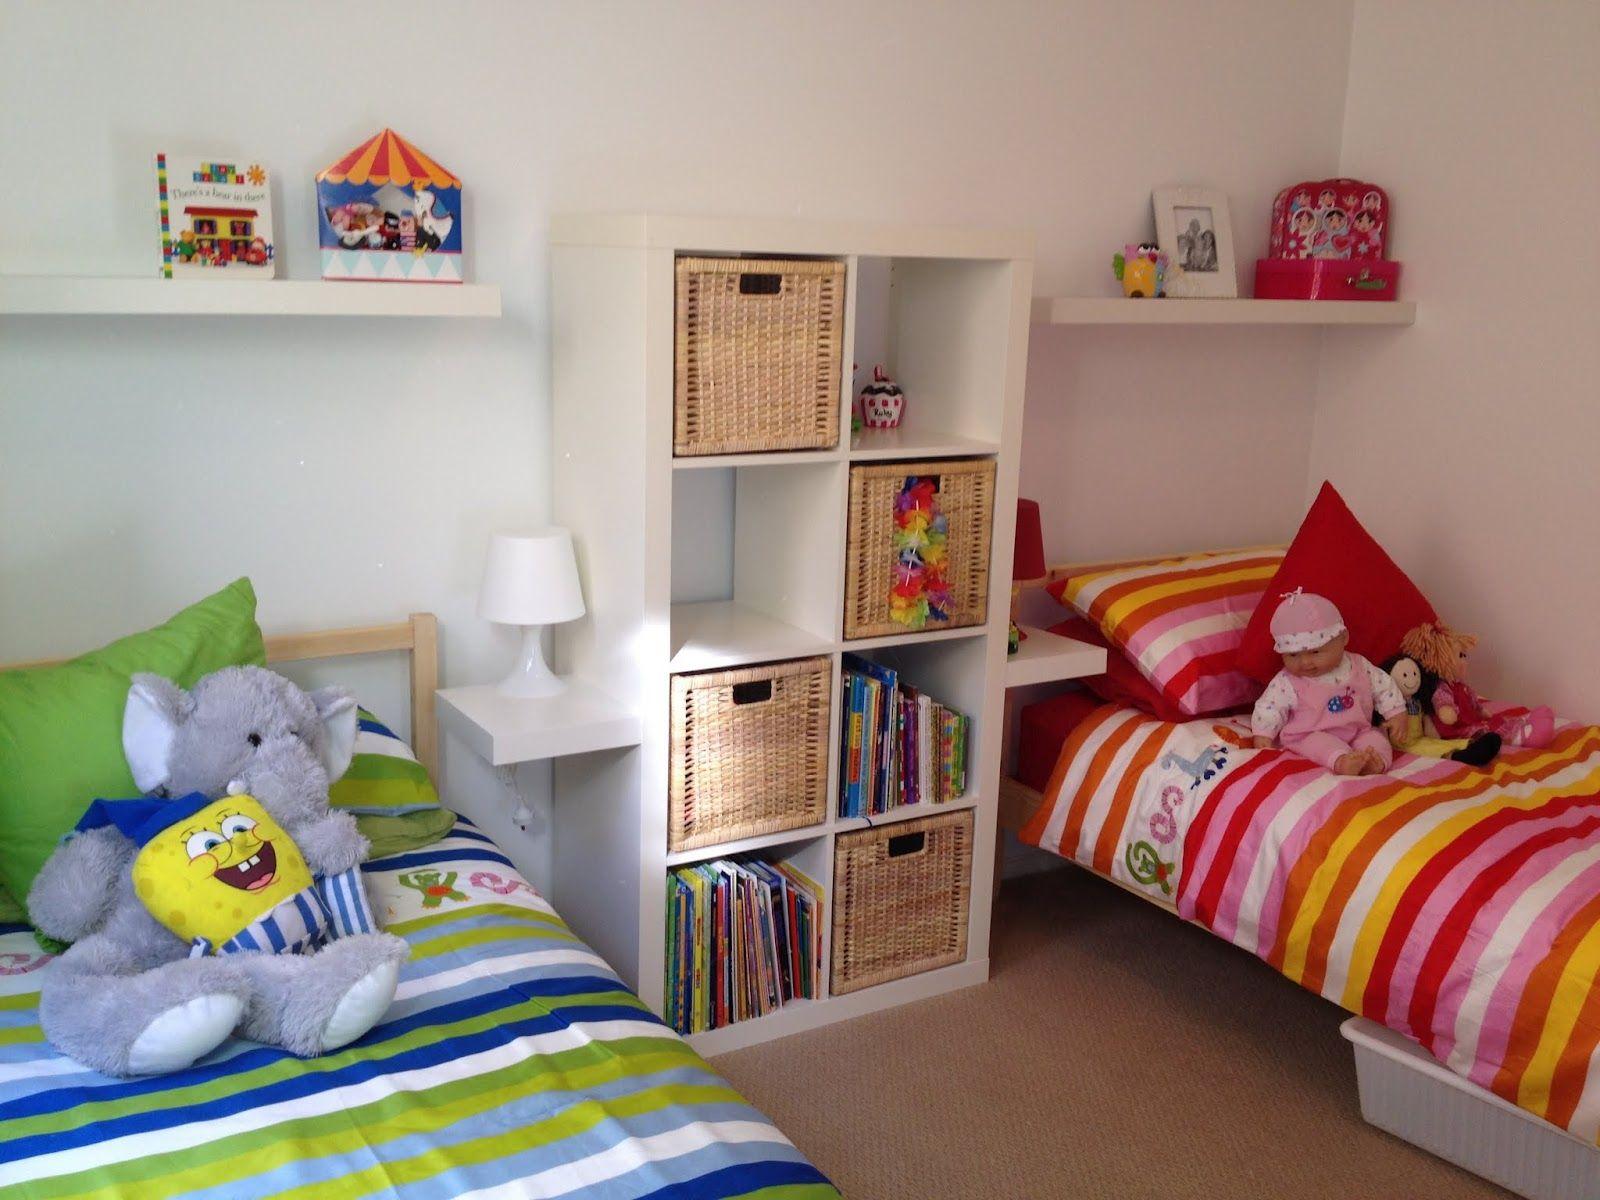 Boys Bedroom Design Ideas Bedroom Ideas For Sisters Sharing A Room As Children Bedroom Ideas